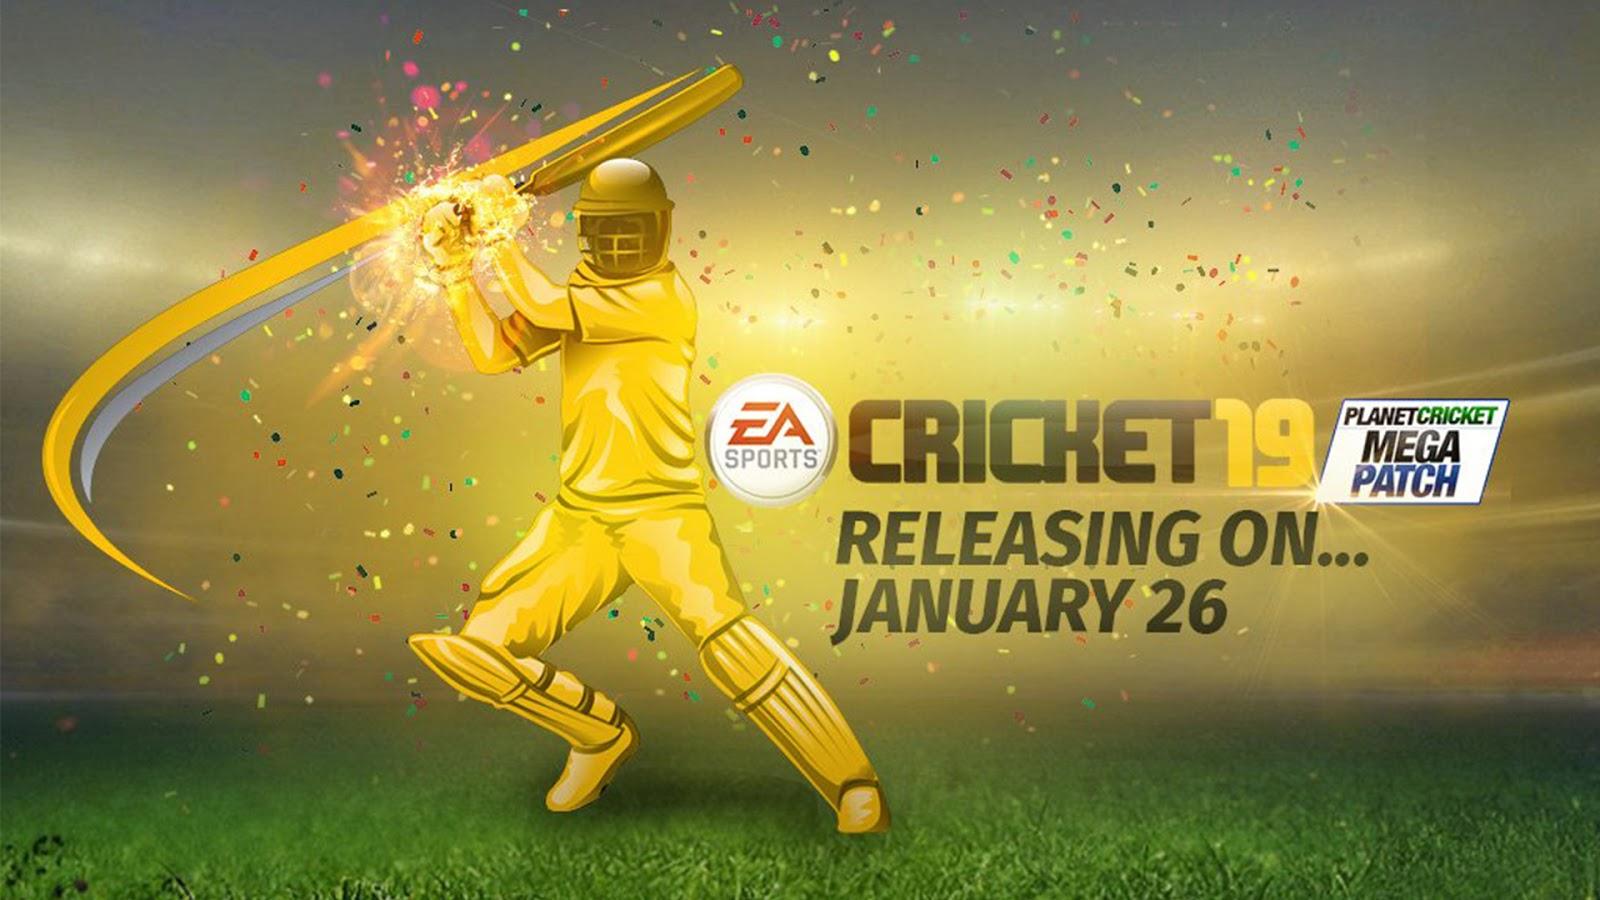 Ea Cricket 2019 Free Download World Wide Game Studio